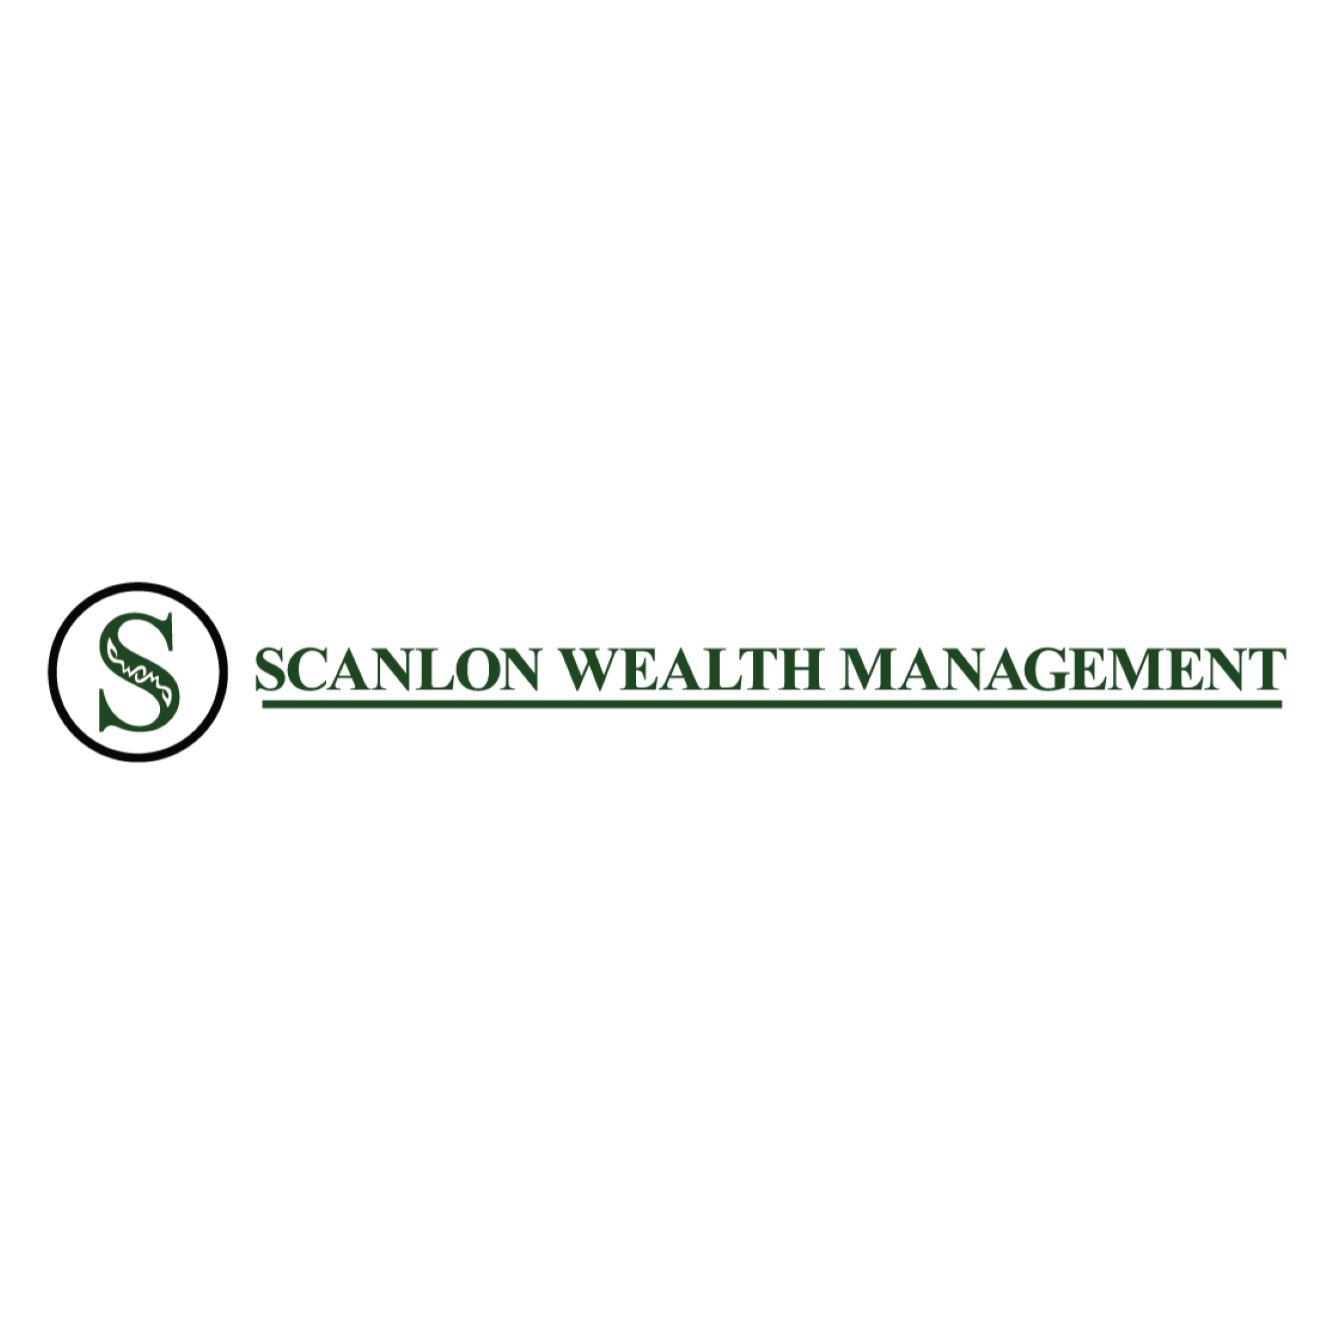 Scanlon Wealth Management